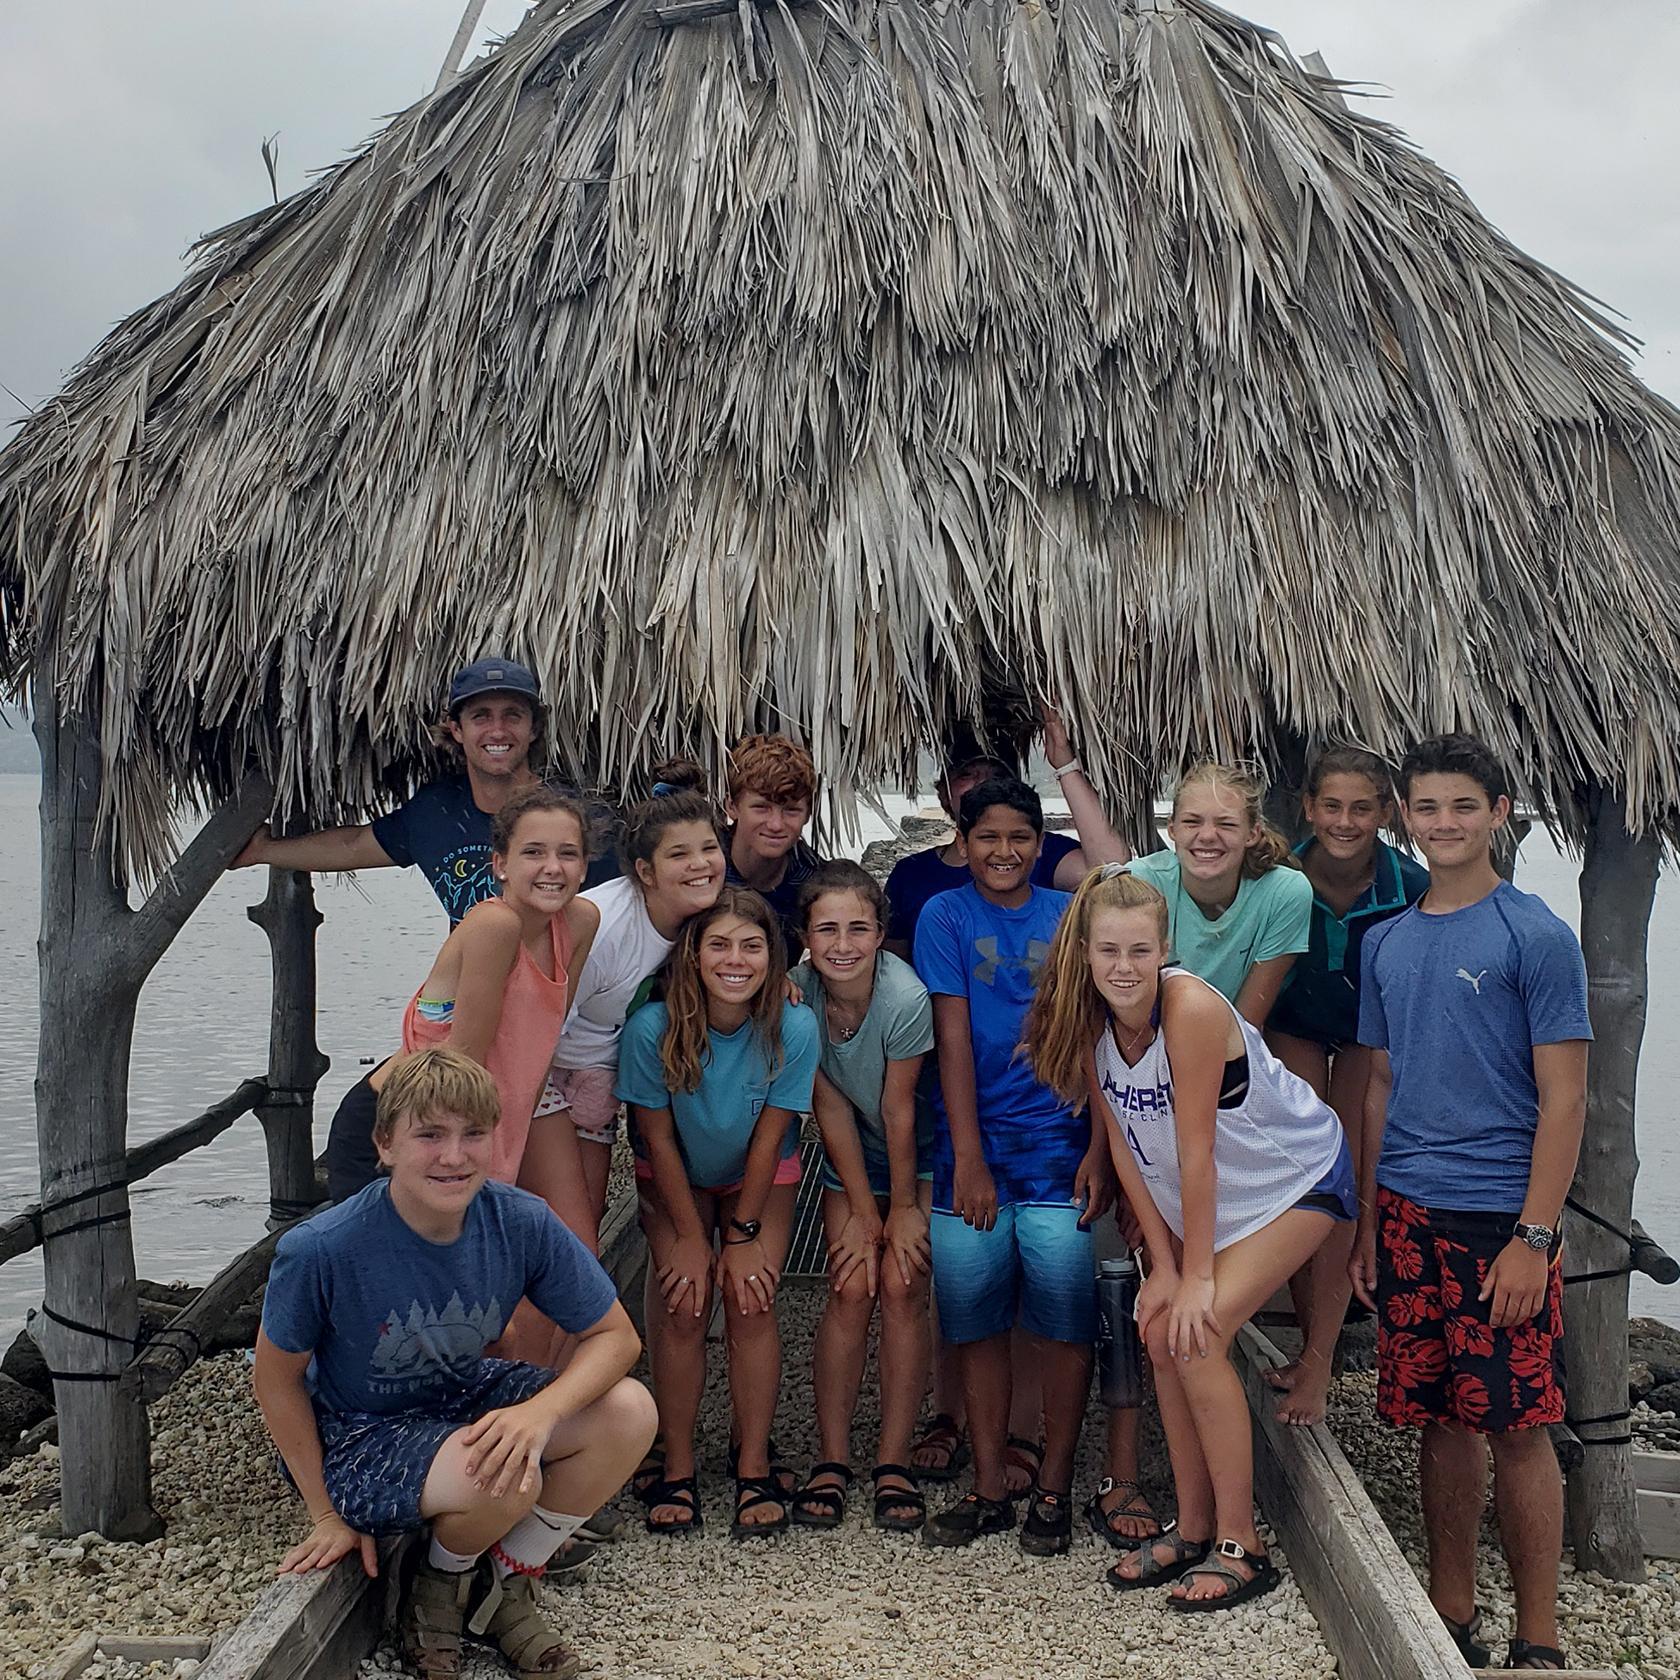 Group photo on the Hawaii Explorer trip